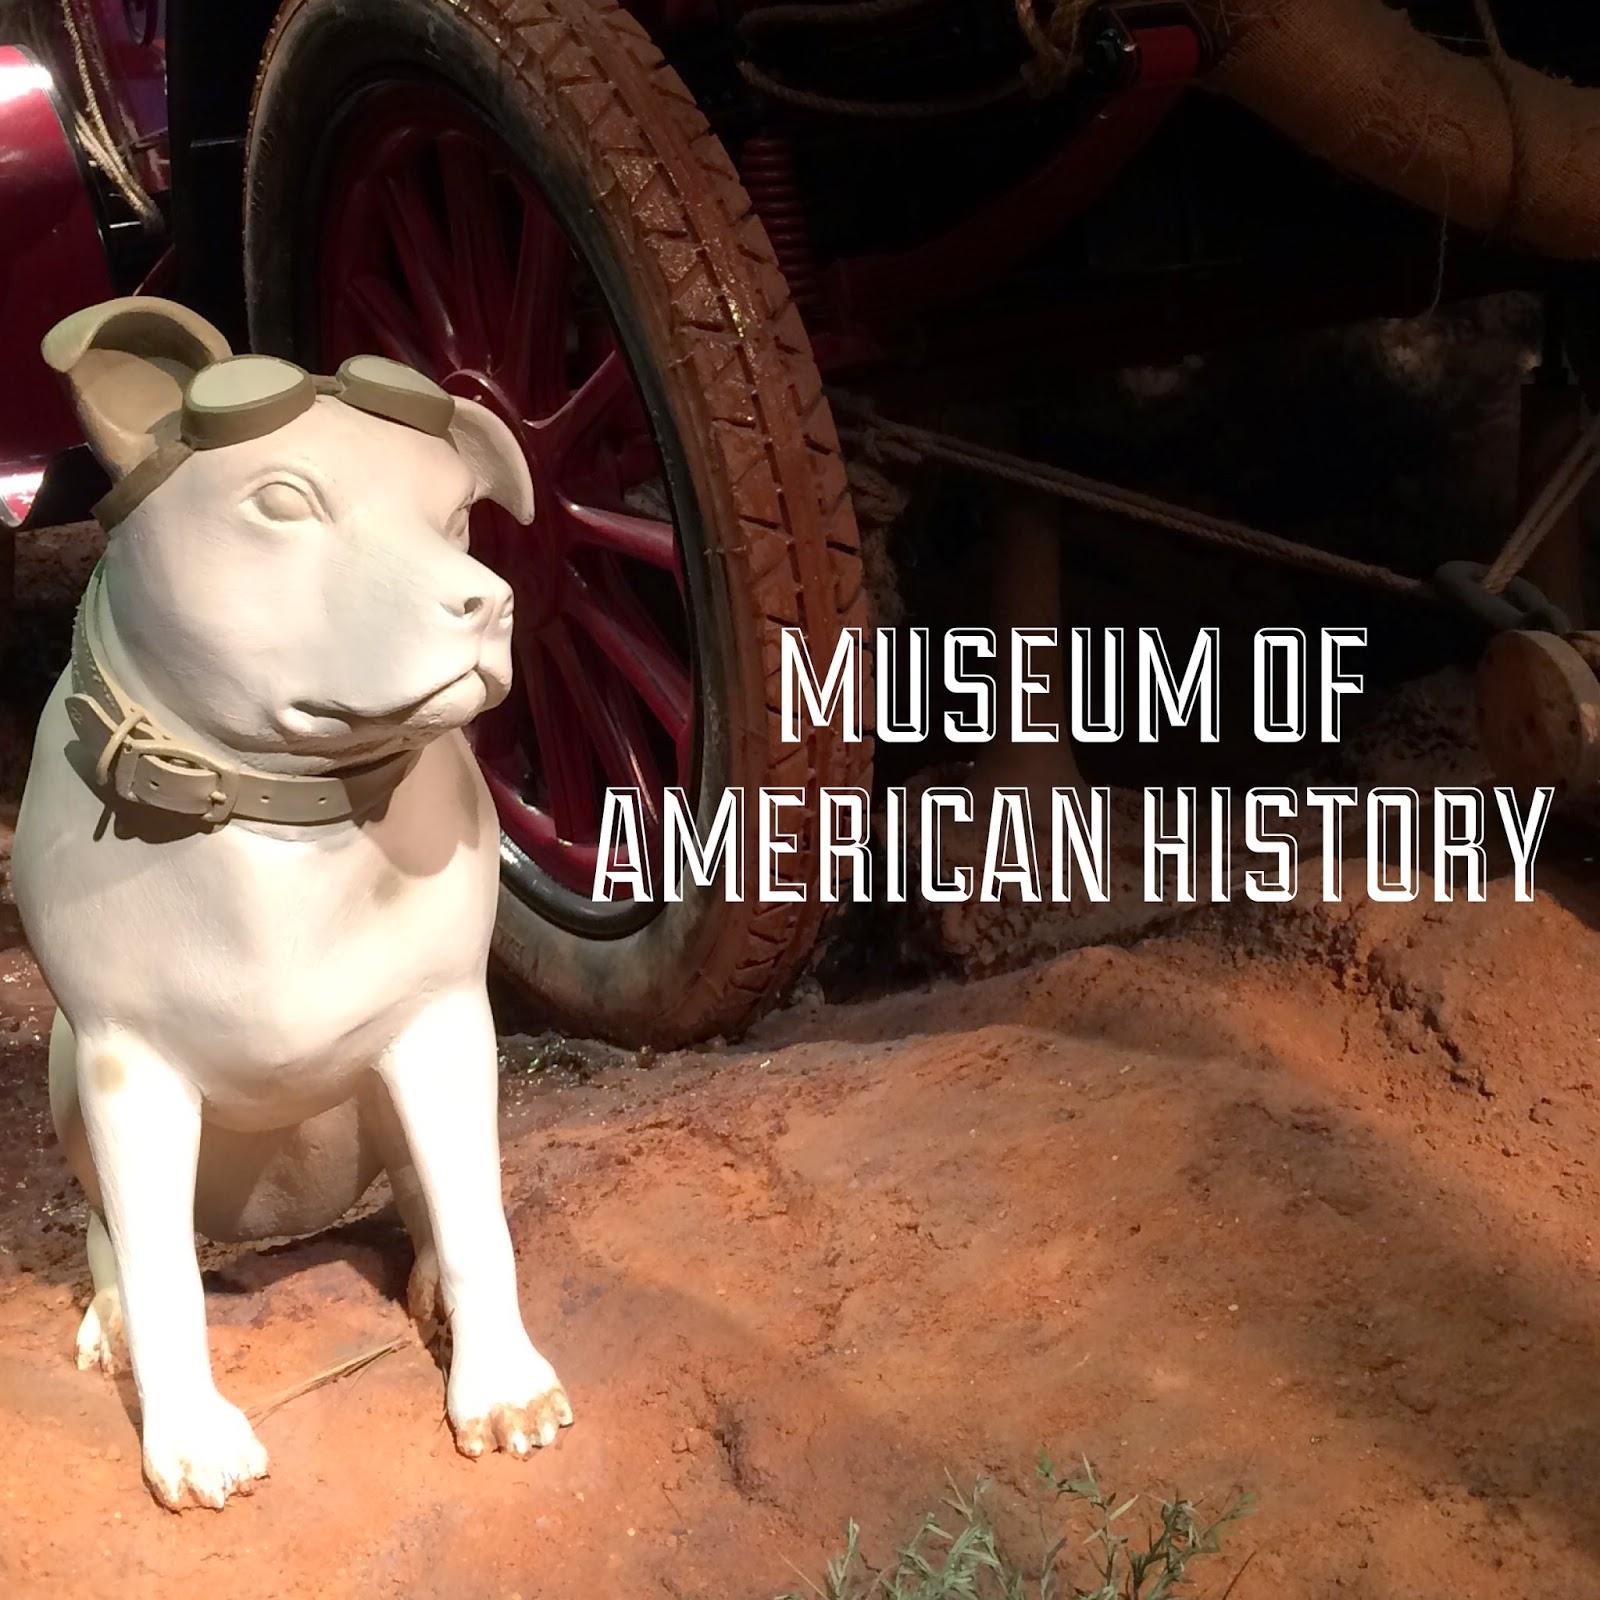 http://melthemidnightbaker.blogspot.com/2014/06/american-history-museum-rolling-thunder.html